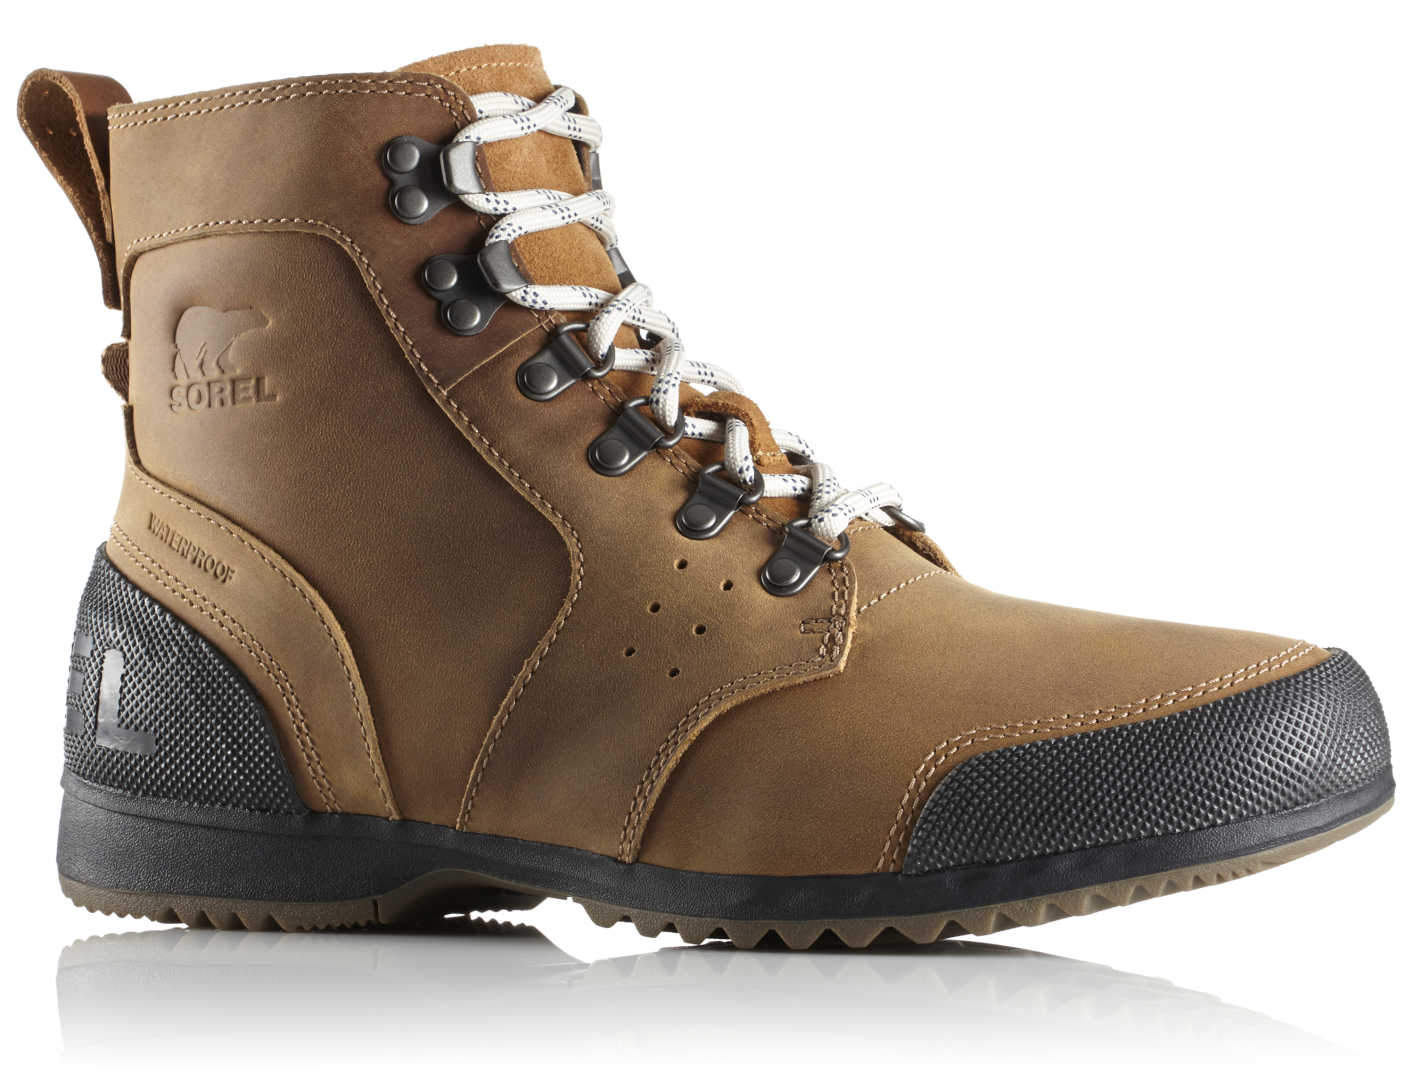 2e5788cc6d9b55 Buty męskie Sorel Ankeny Mid Hiker-Elk Black - Sklep internetowy ...